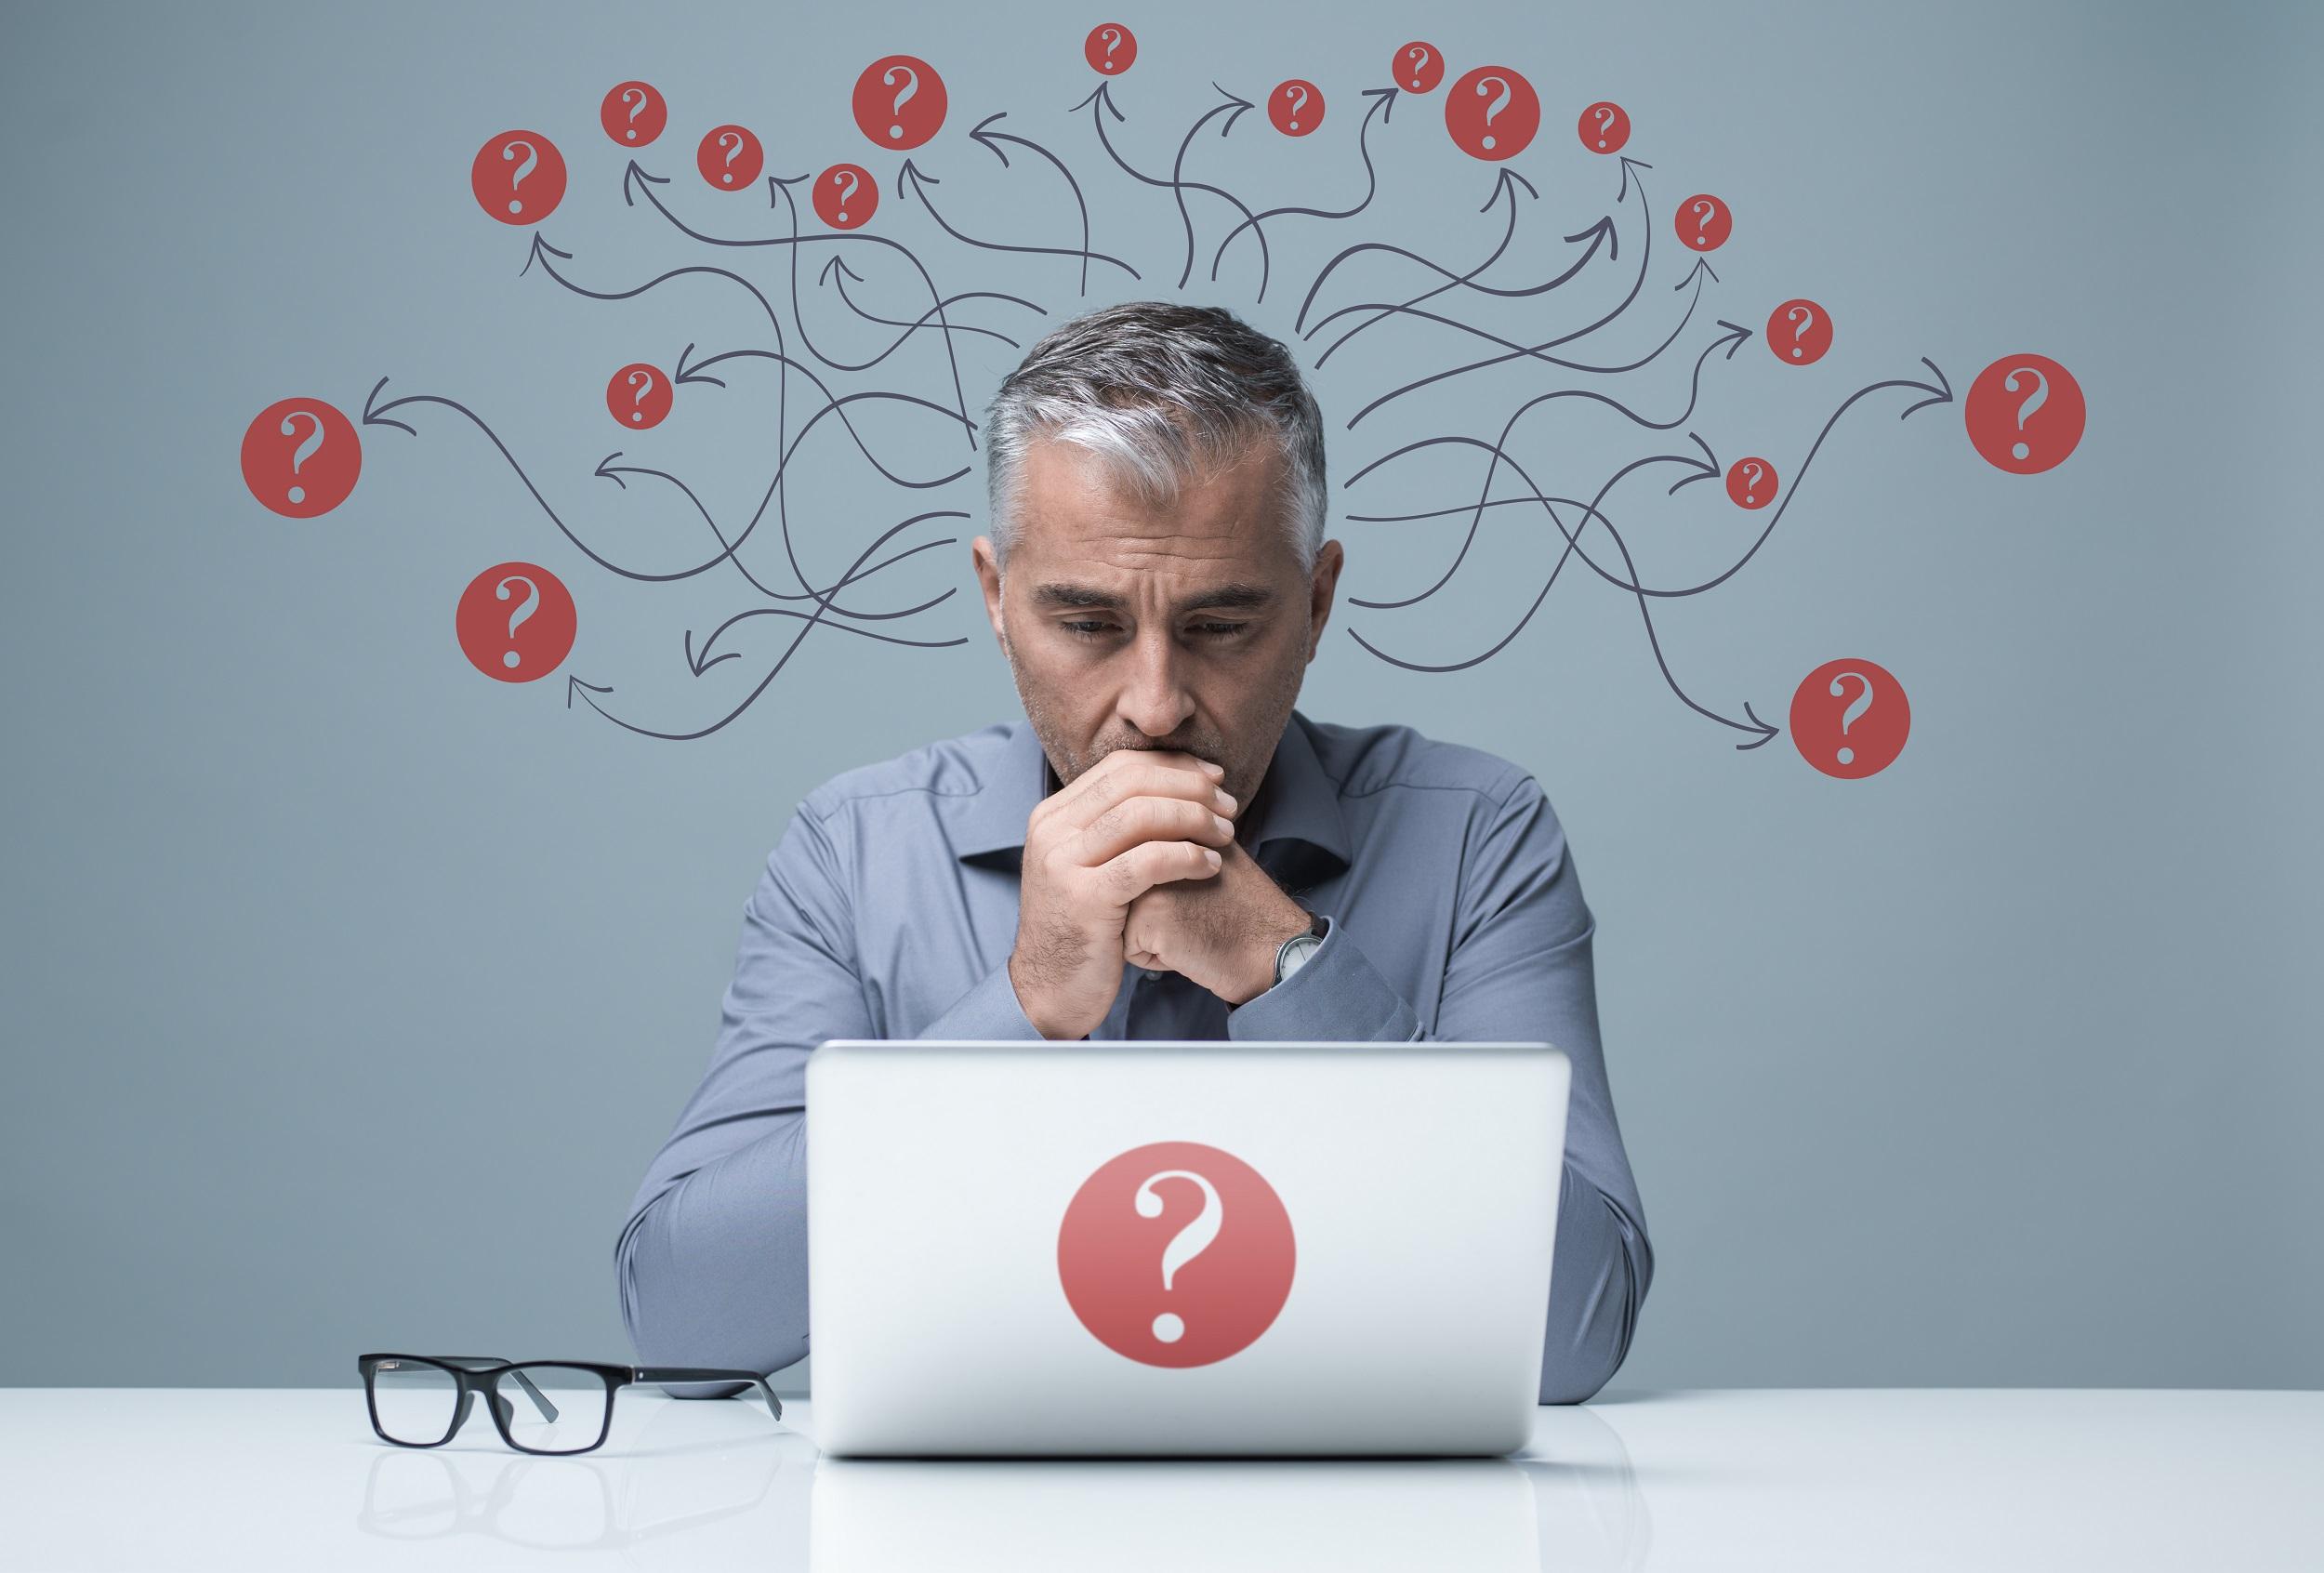 Pensive businessman at laptop.